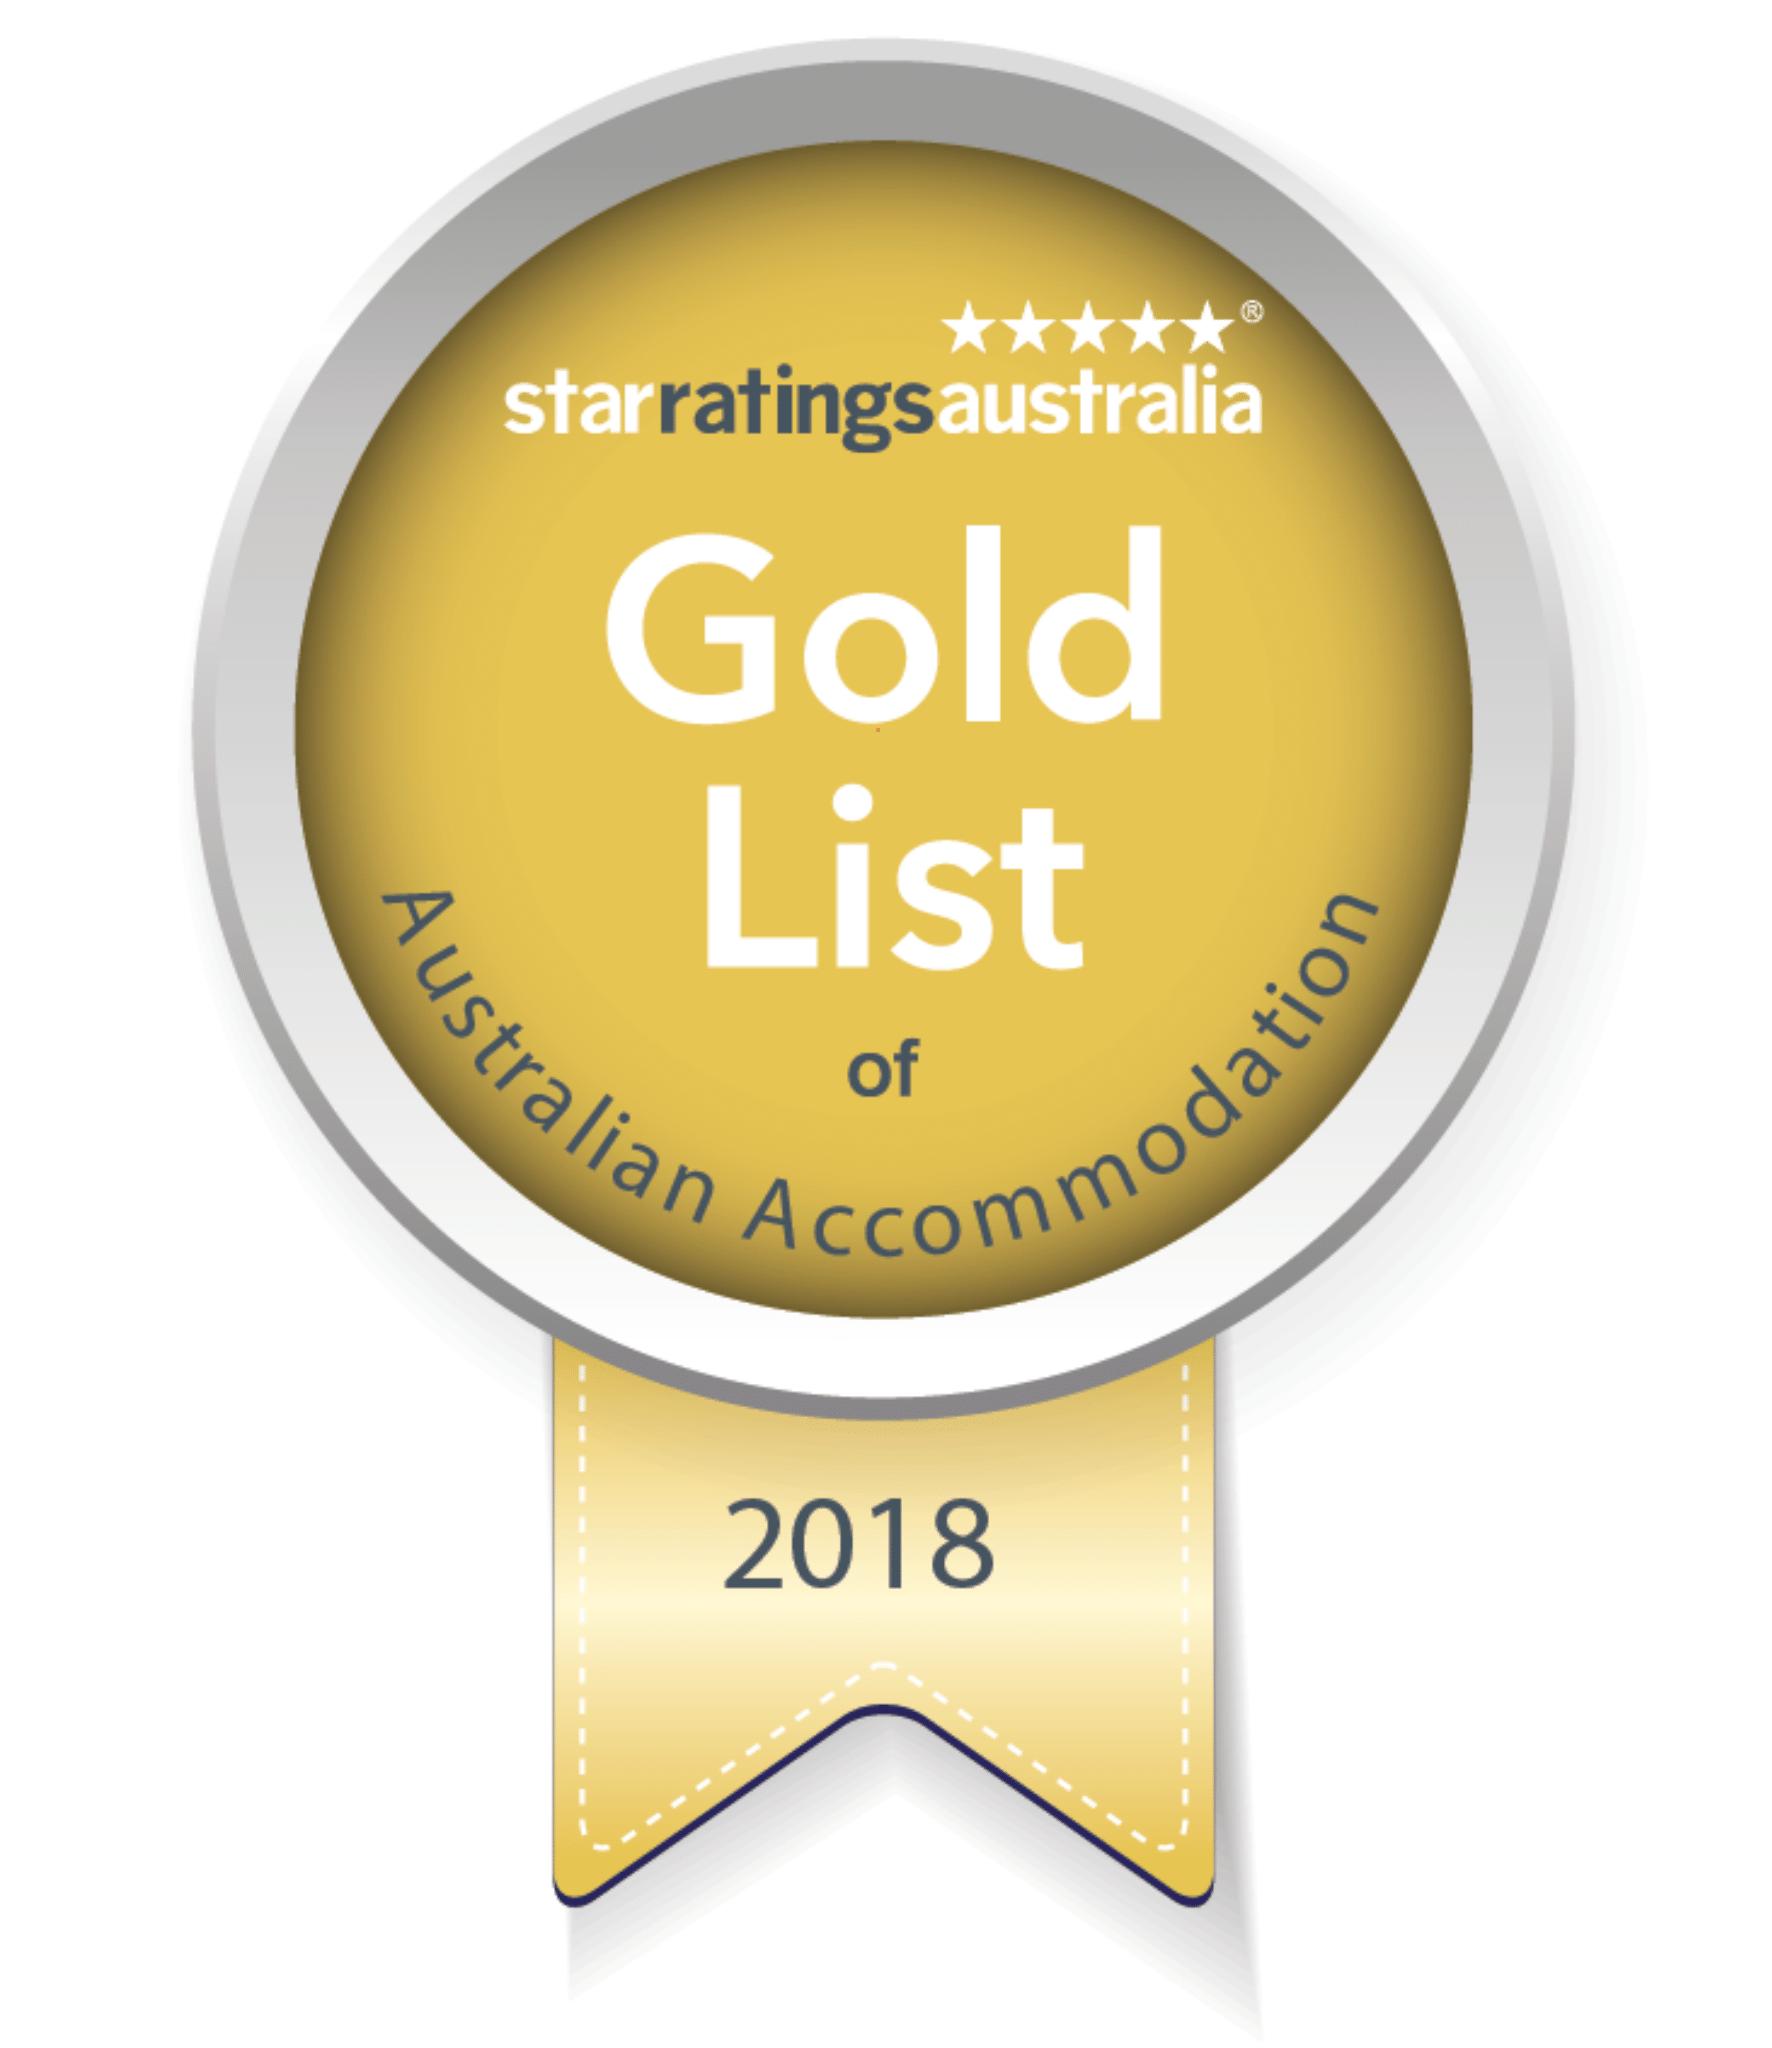 Number 5 in Australias Gold List